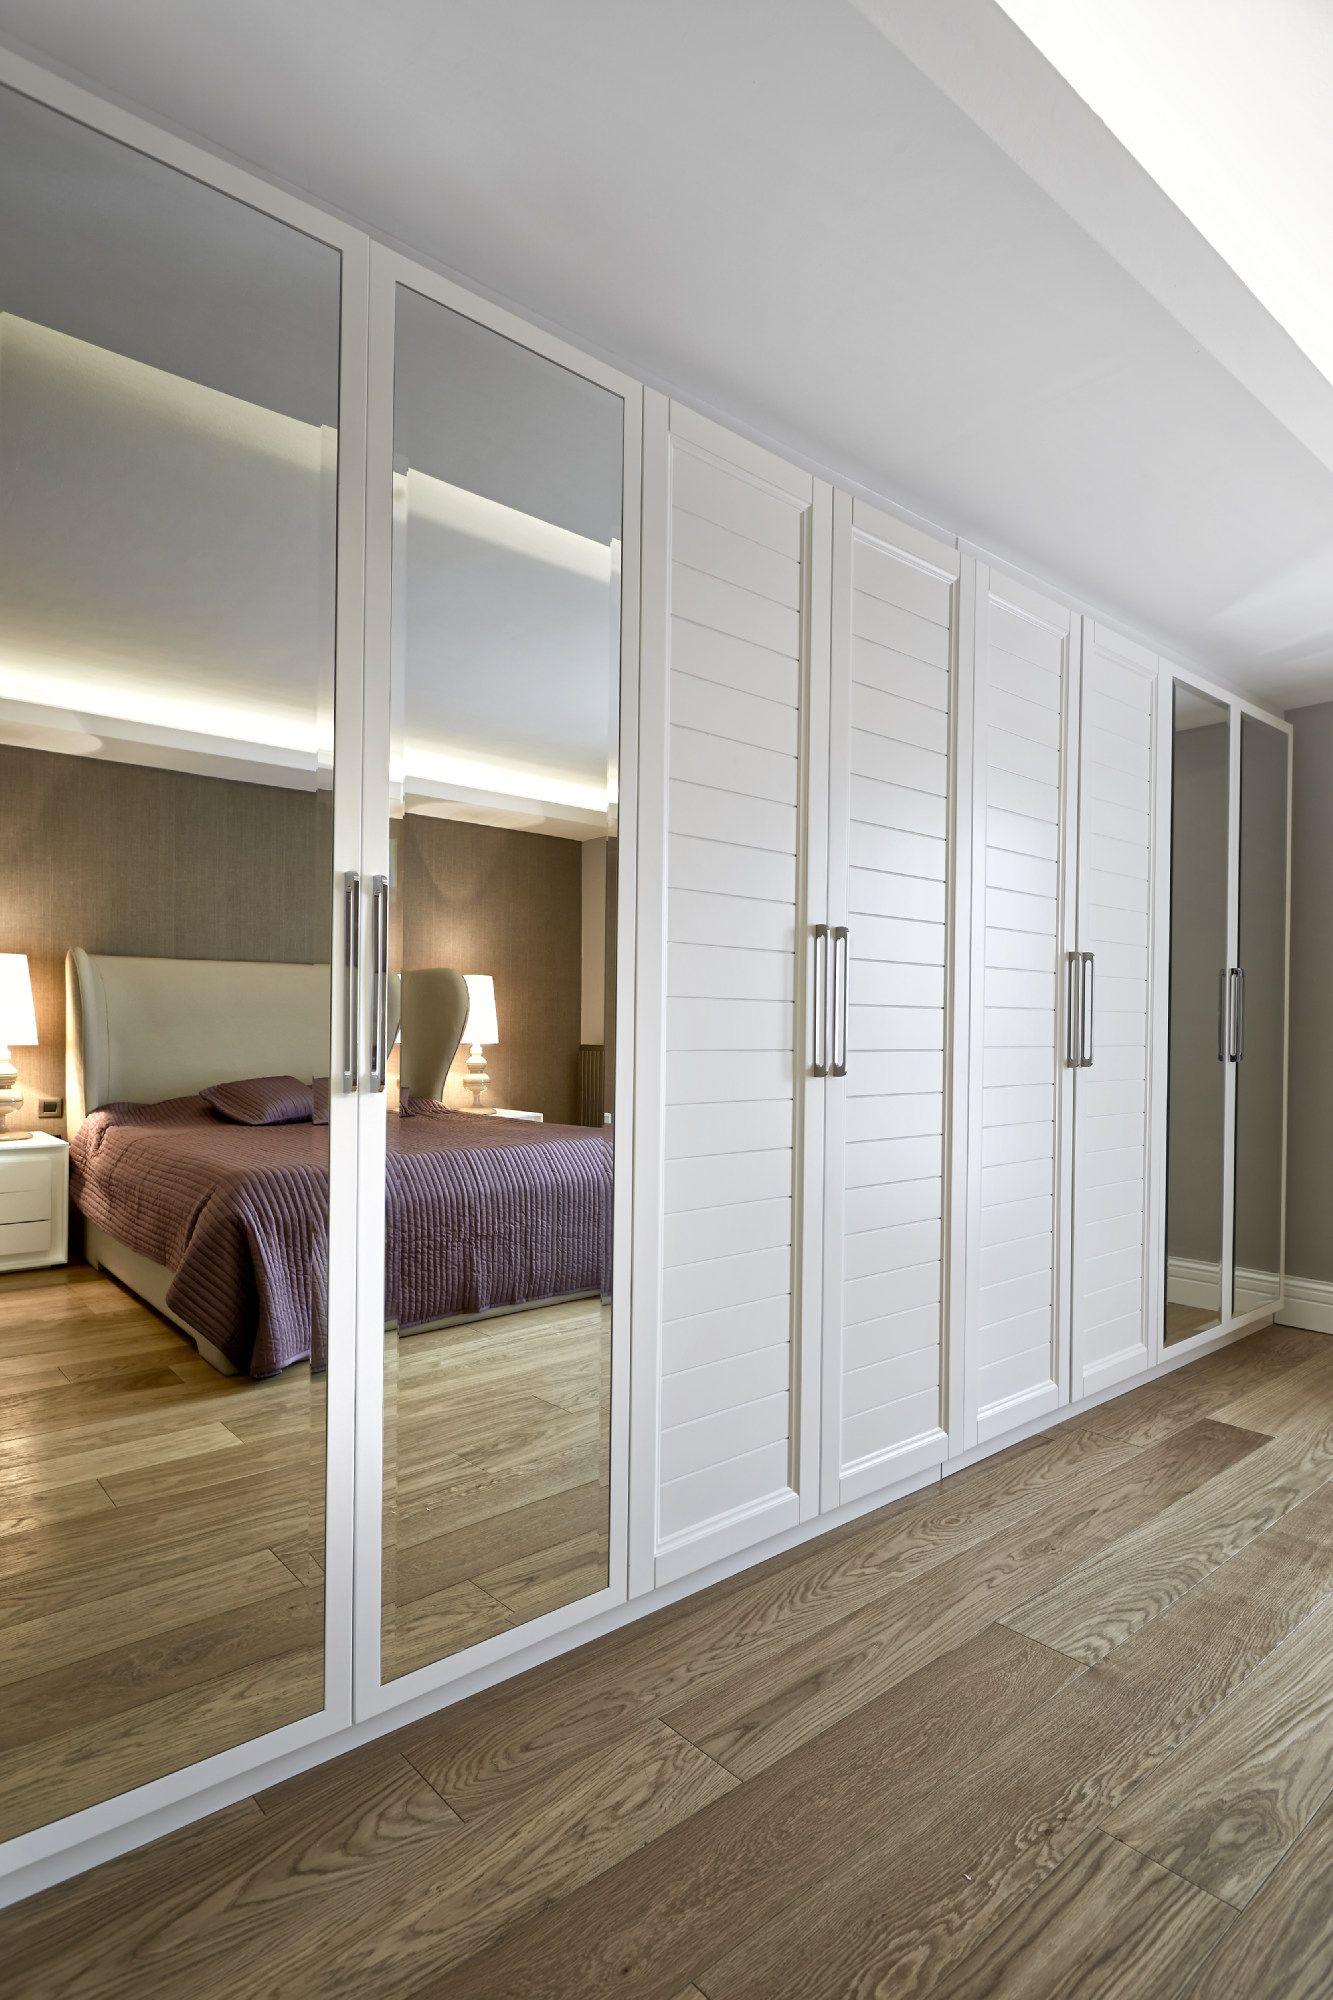 Master Bedroom - House Interior - Onur Koksal   Alya oda   Pinterest ...